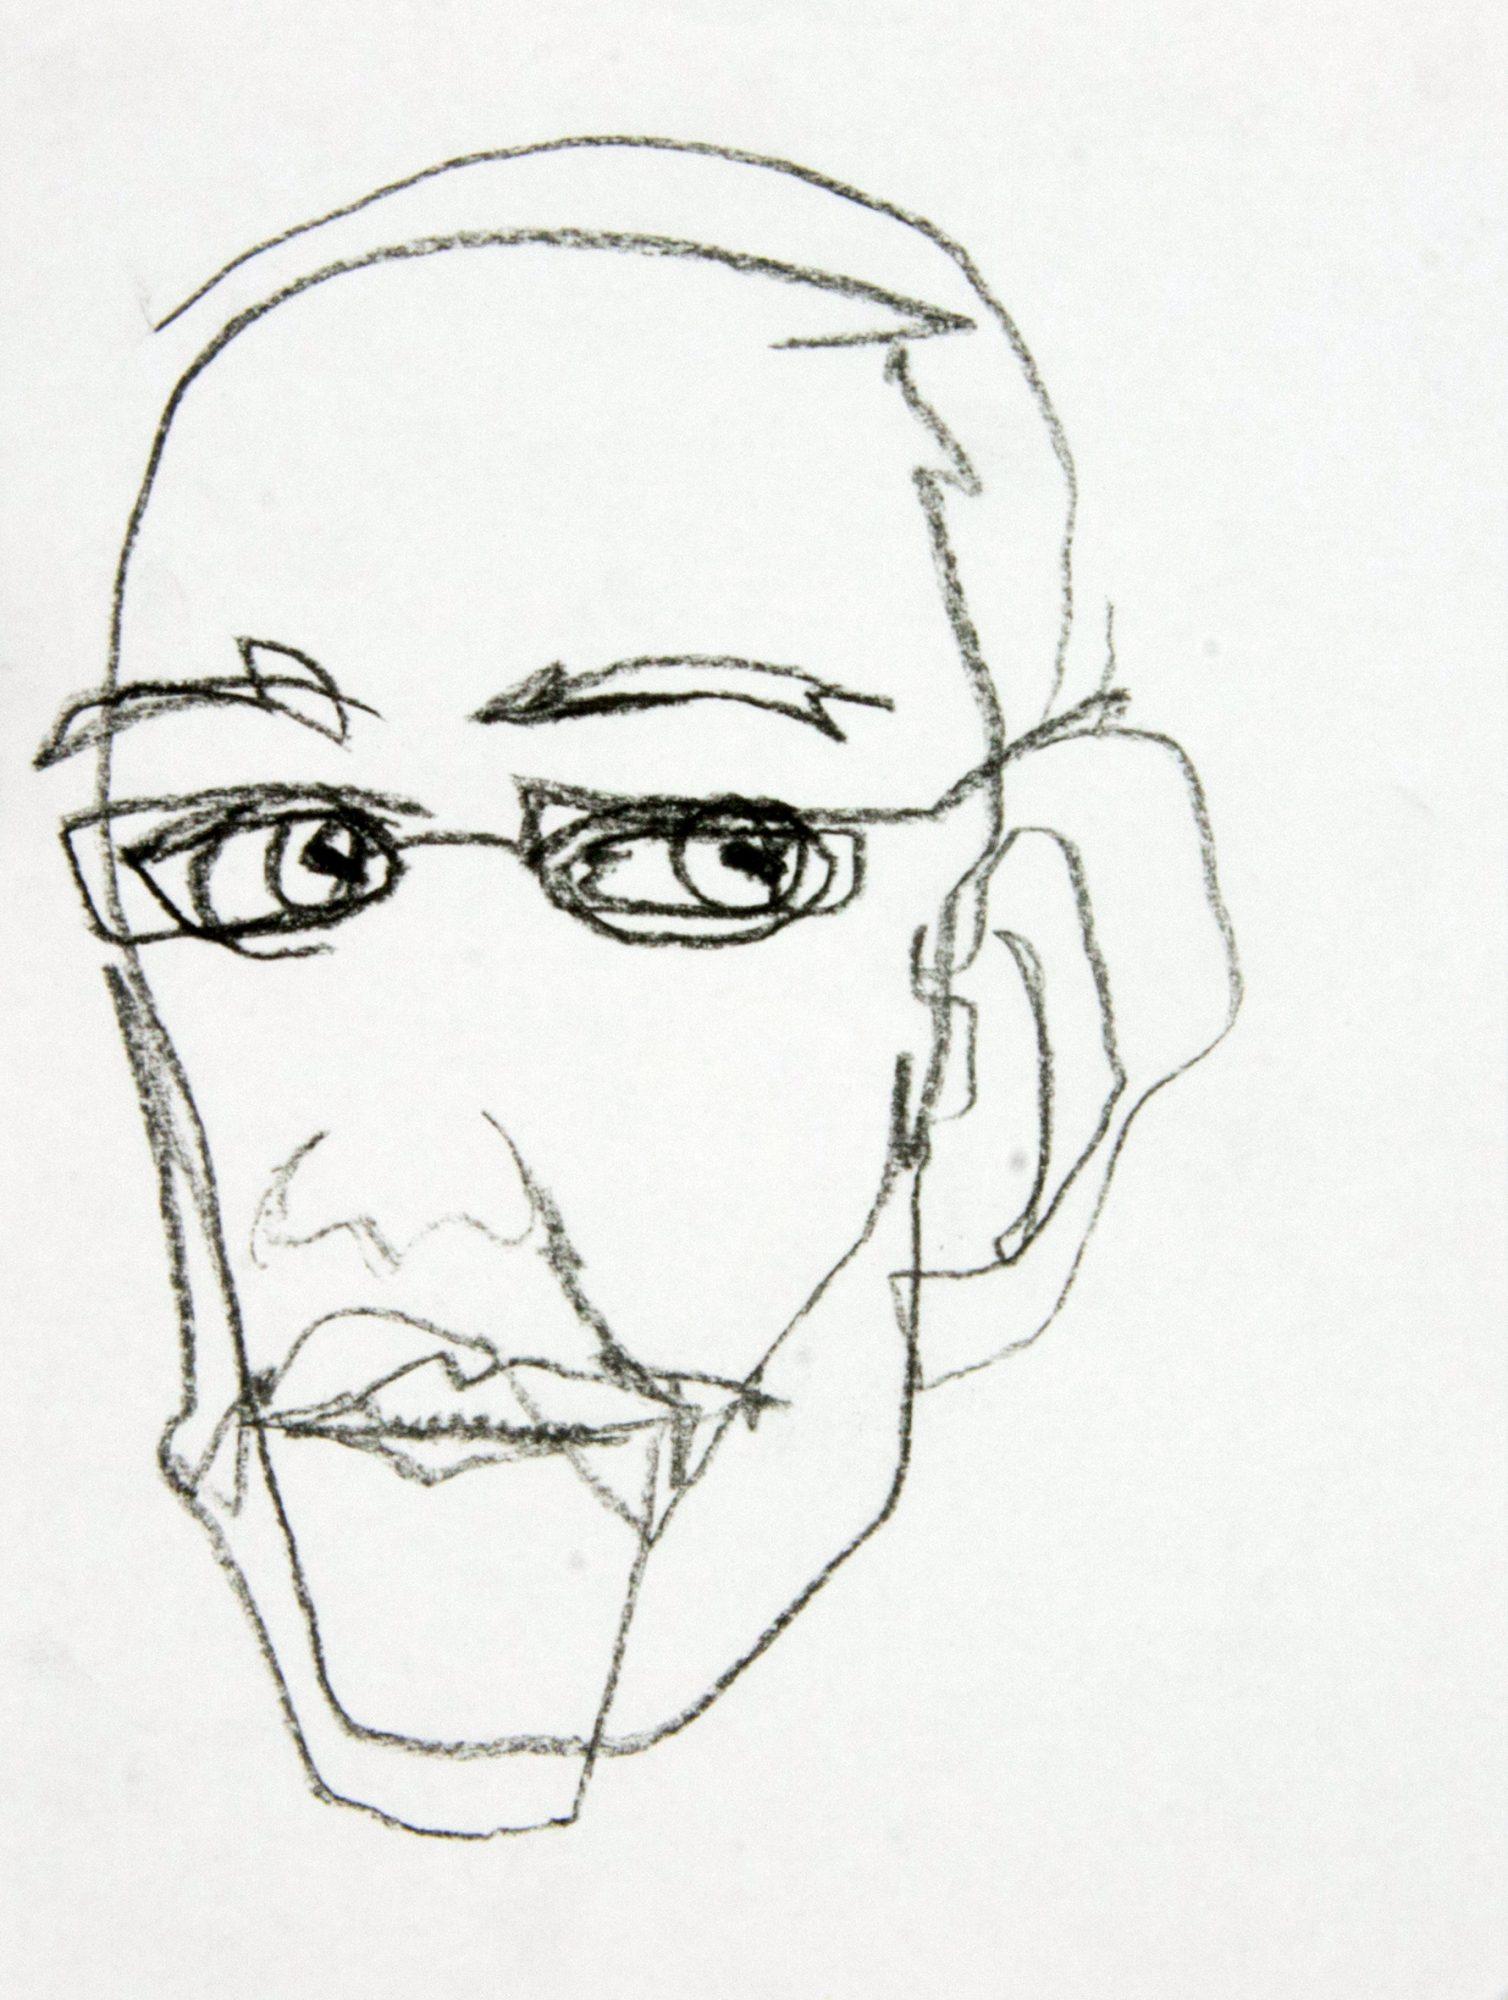 35-green-drawing-21-x-15-2011